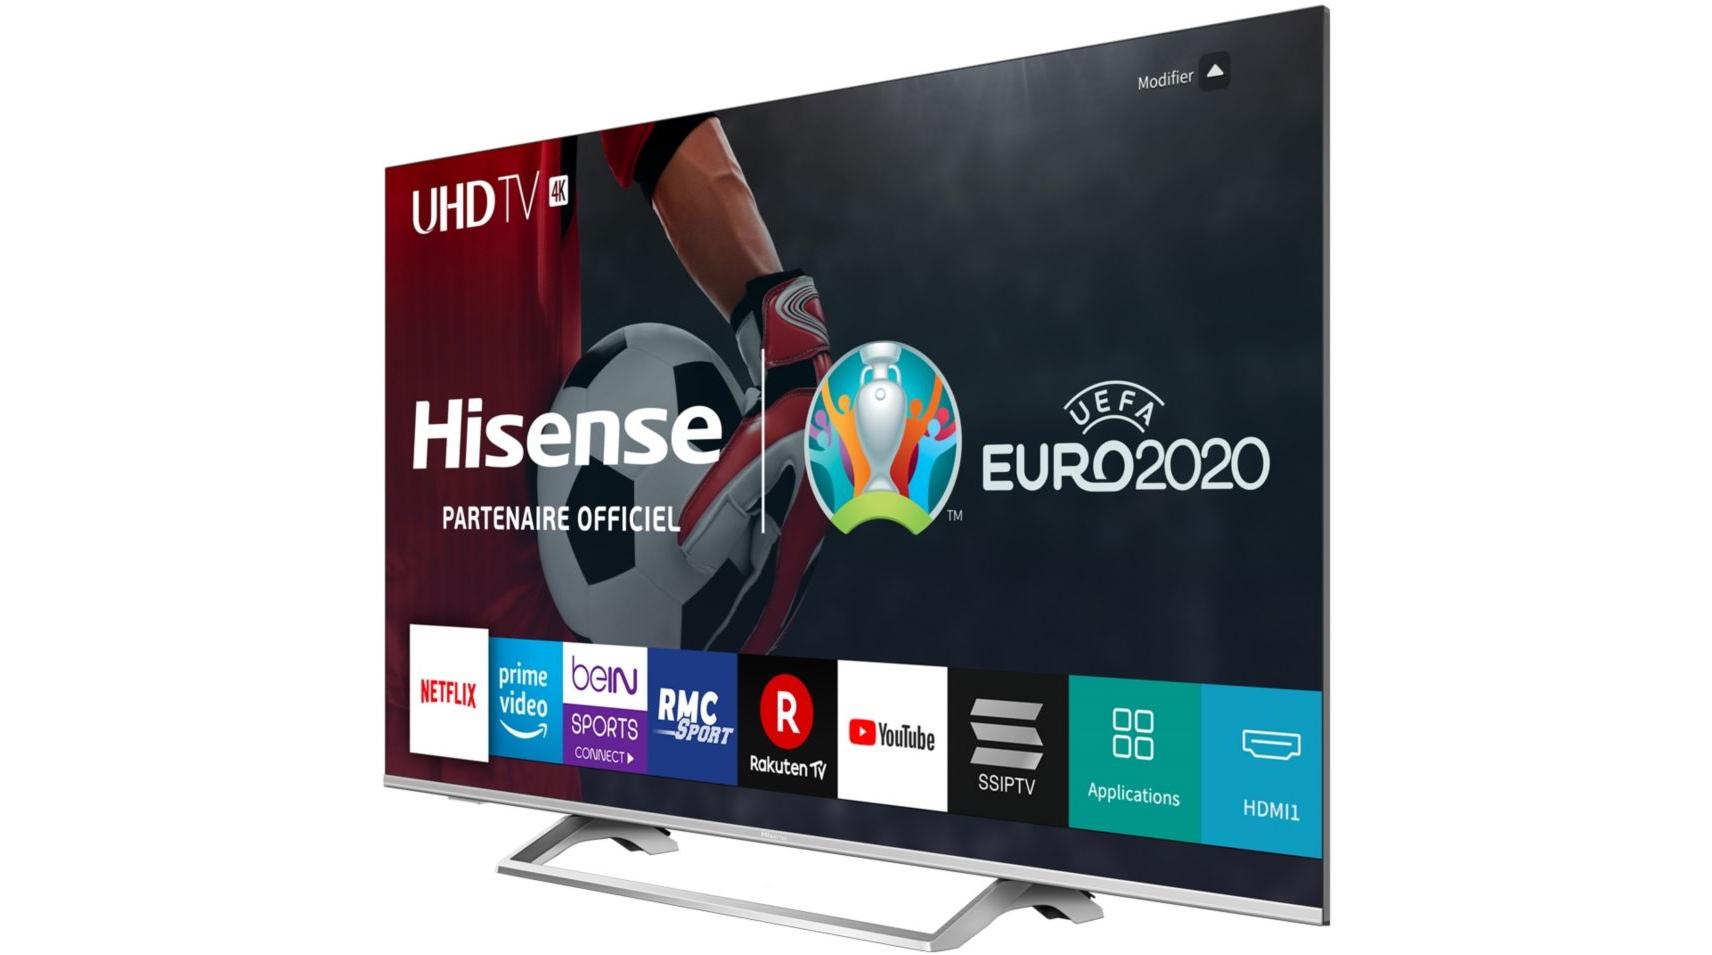 "TV 65"" Hisense H65B7500 - UHD 4K, Dolby Vision, HDR10+, Smart TV (Via ODR 200€)"